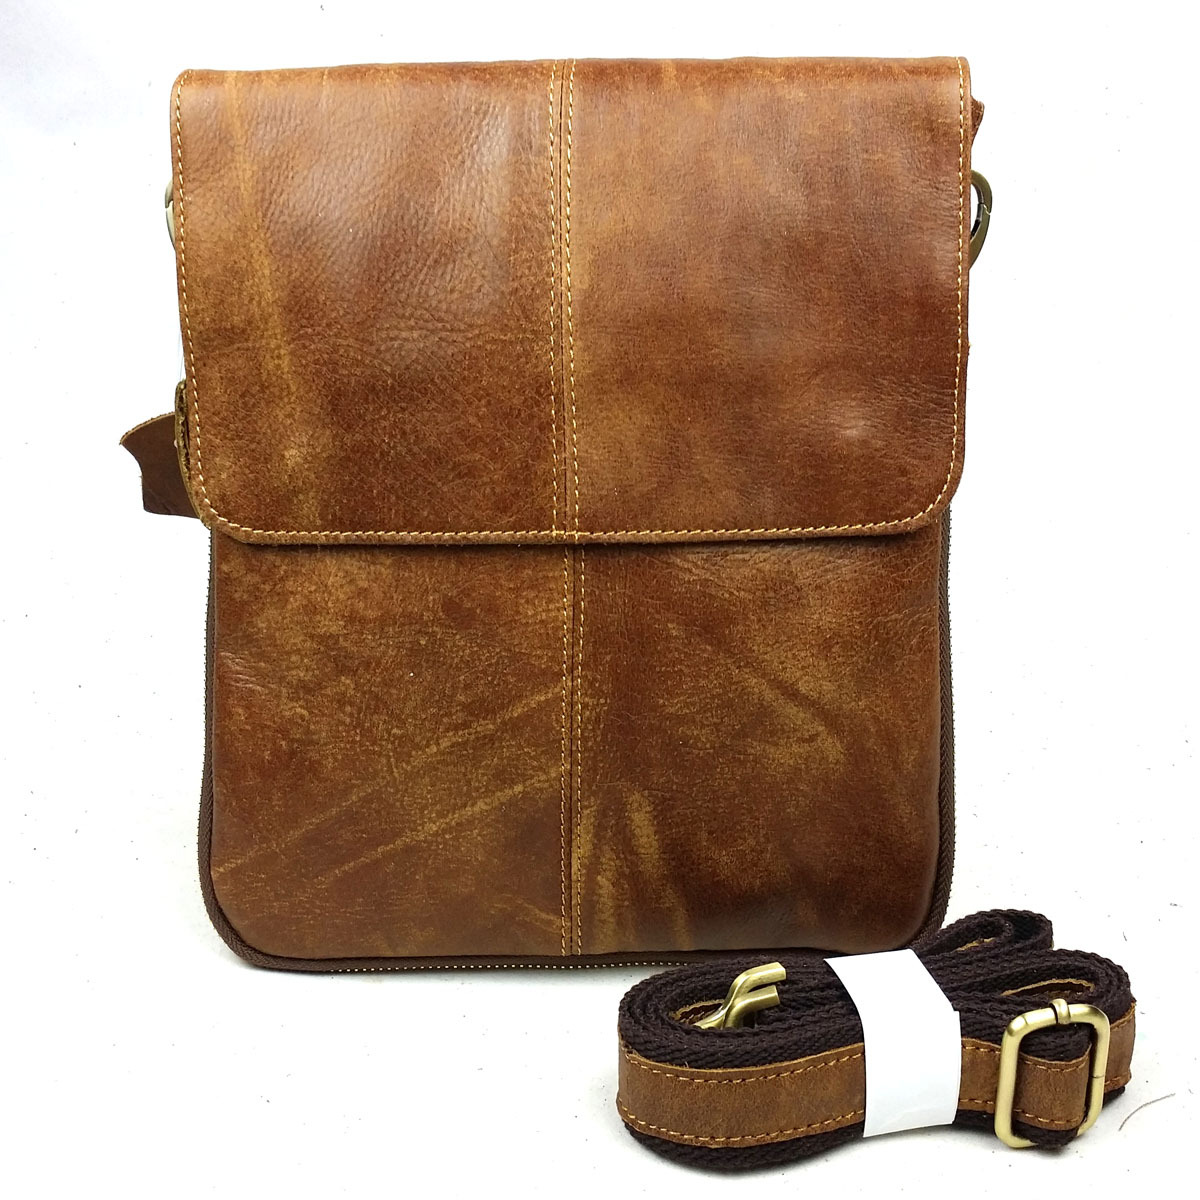 First Layer Cow Skin 100% Genuine Leather Bag For Men Vintage Style Men's Business Messenge Bag Tablet PC handbag YS1313 first layer cow skin 100